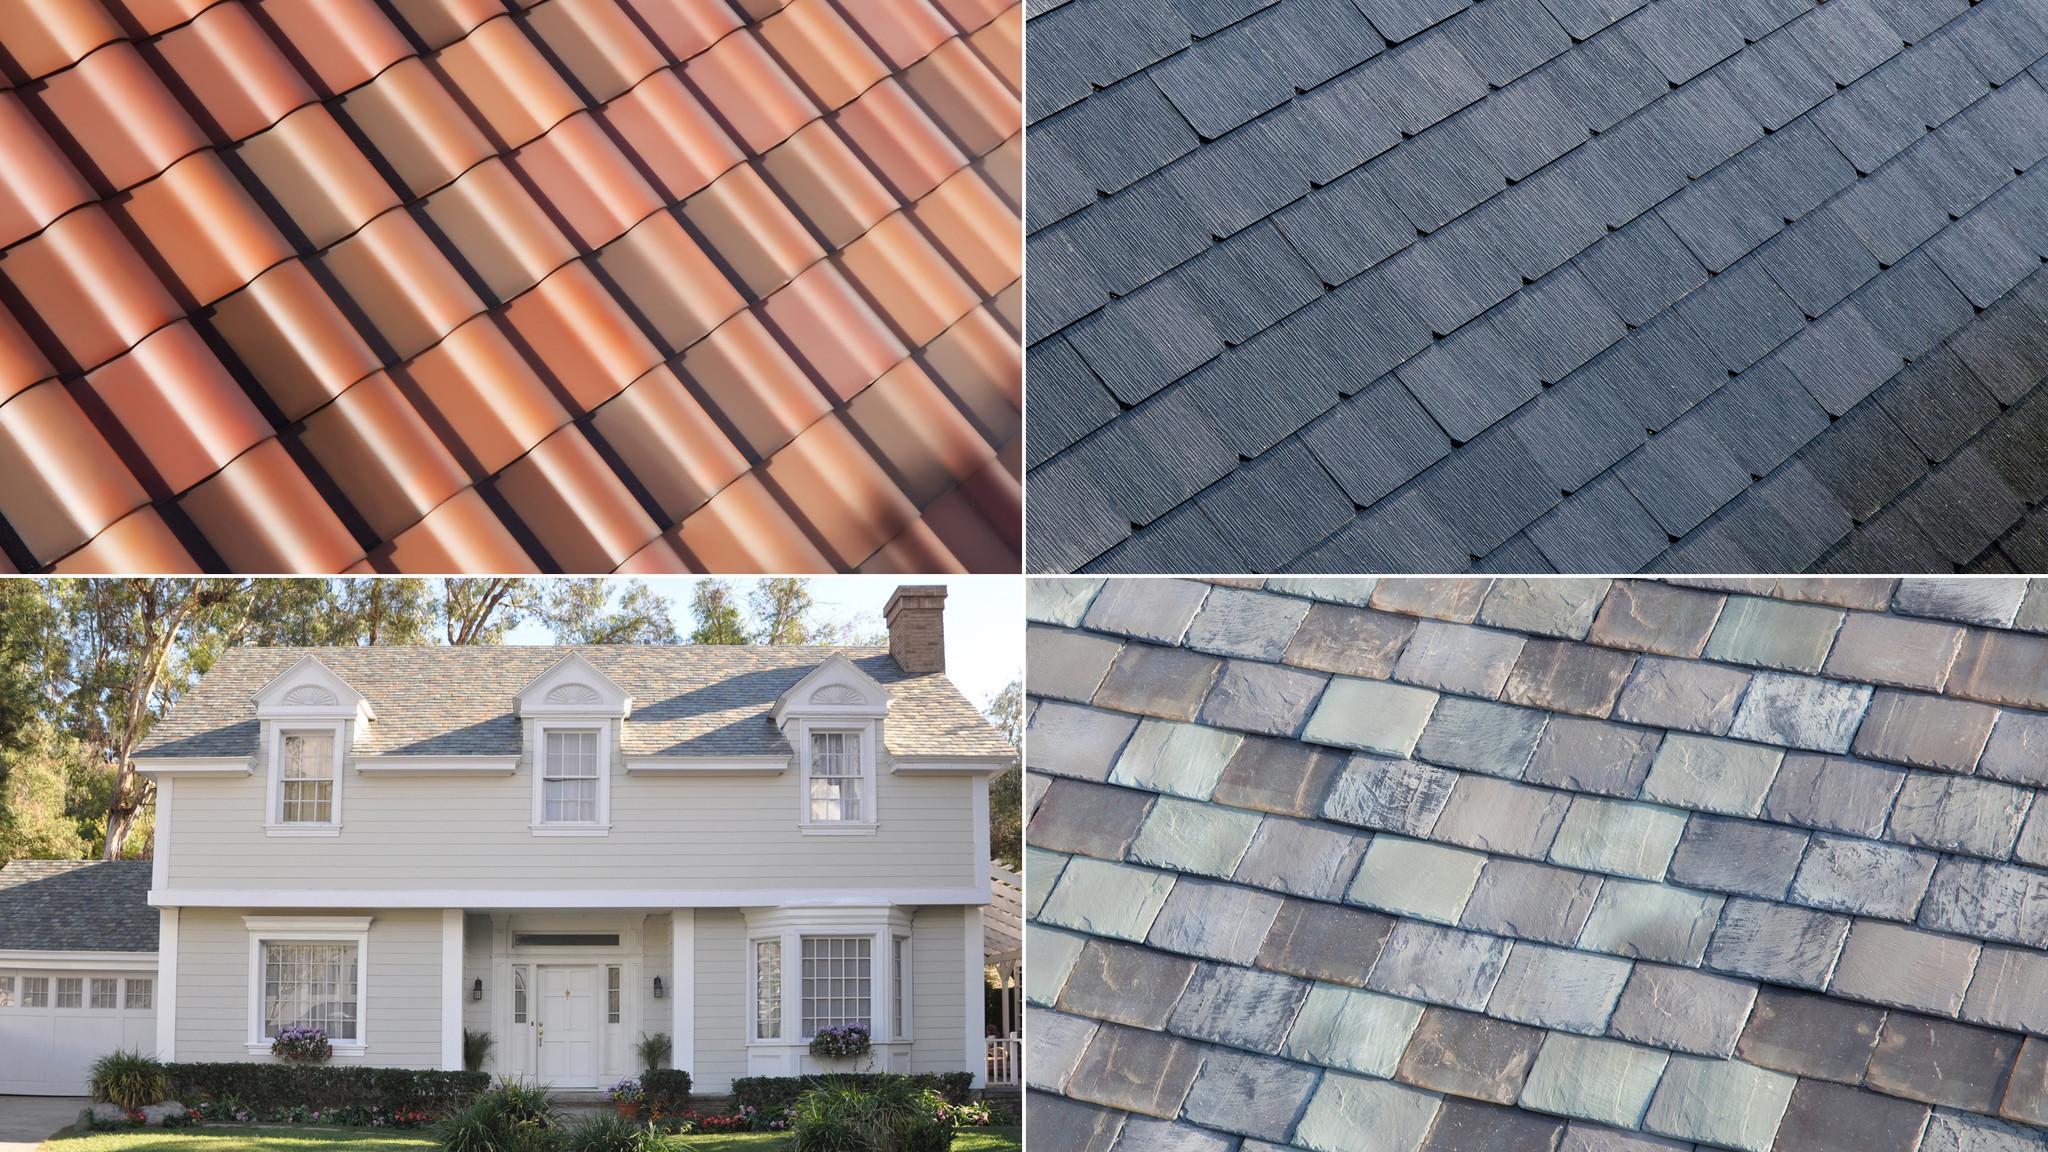 la-fi-tesla-solar-roof